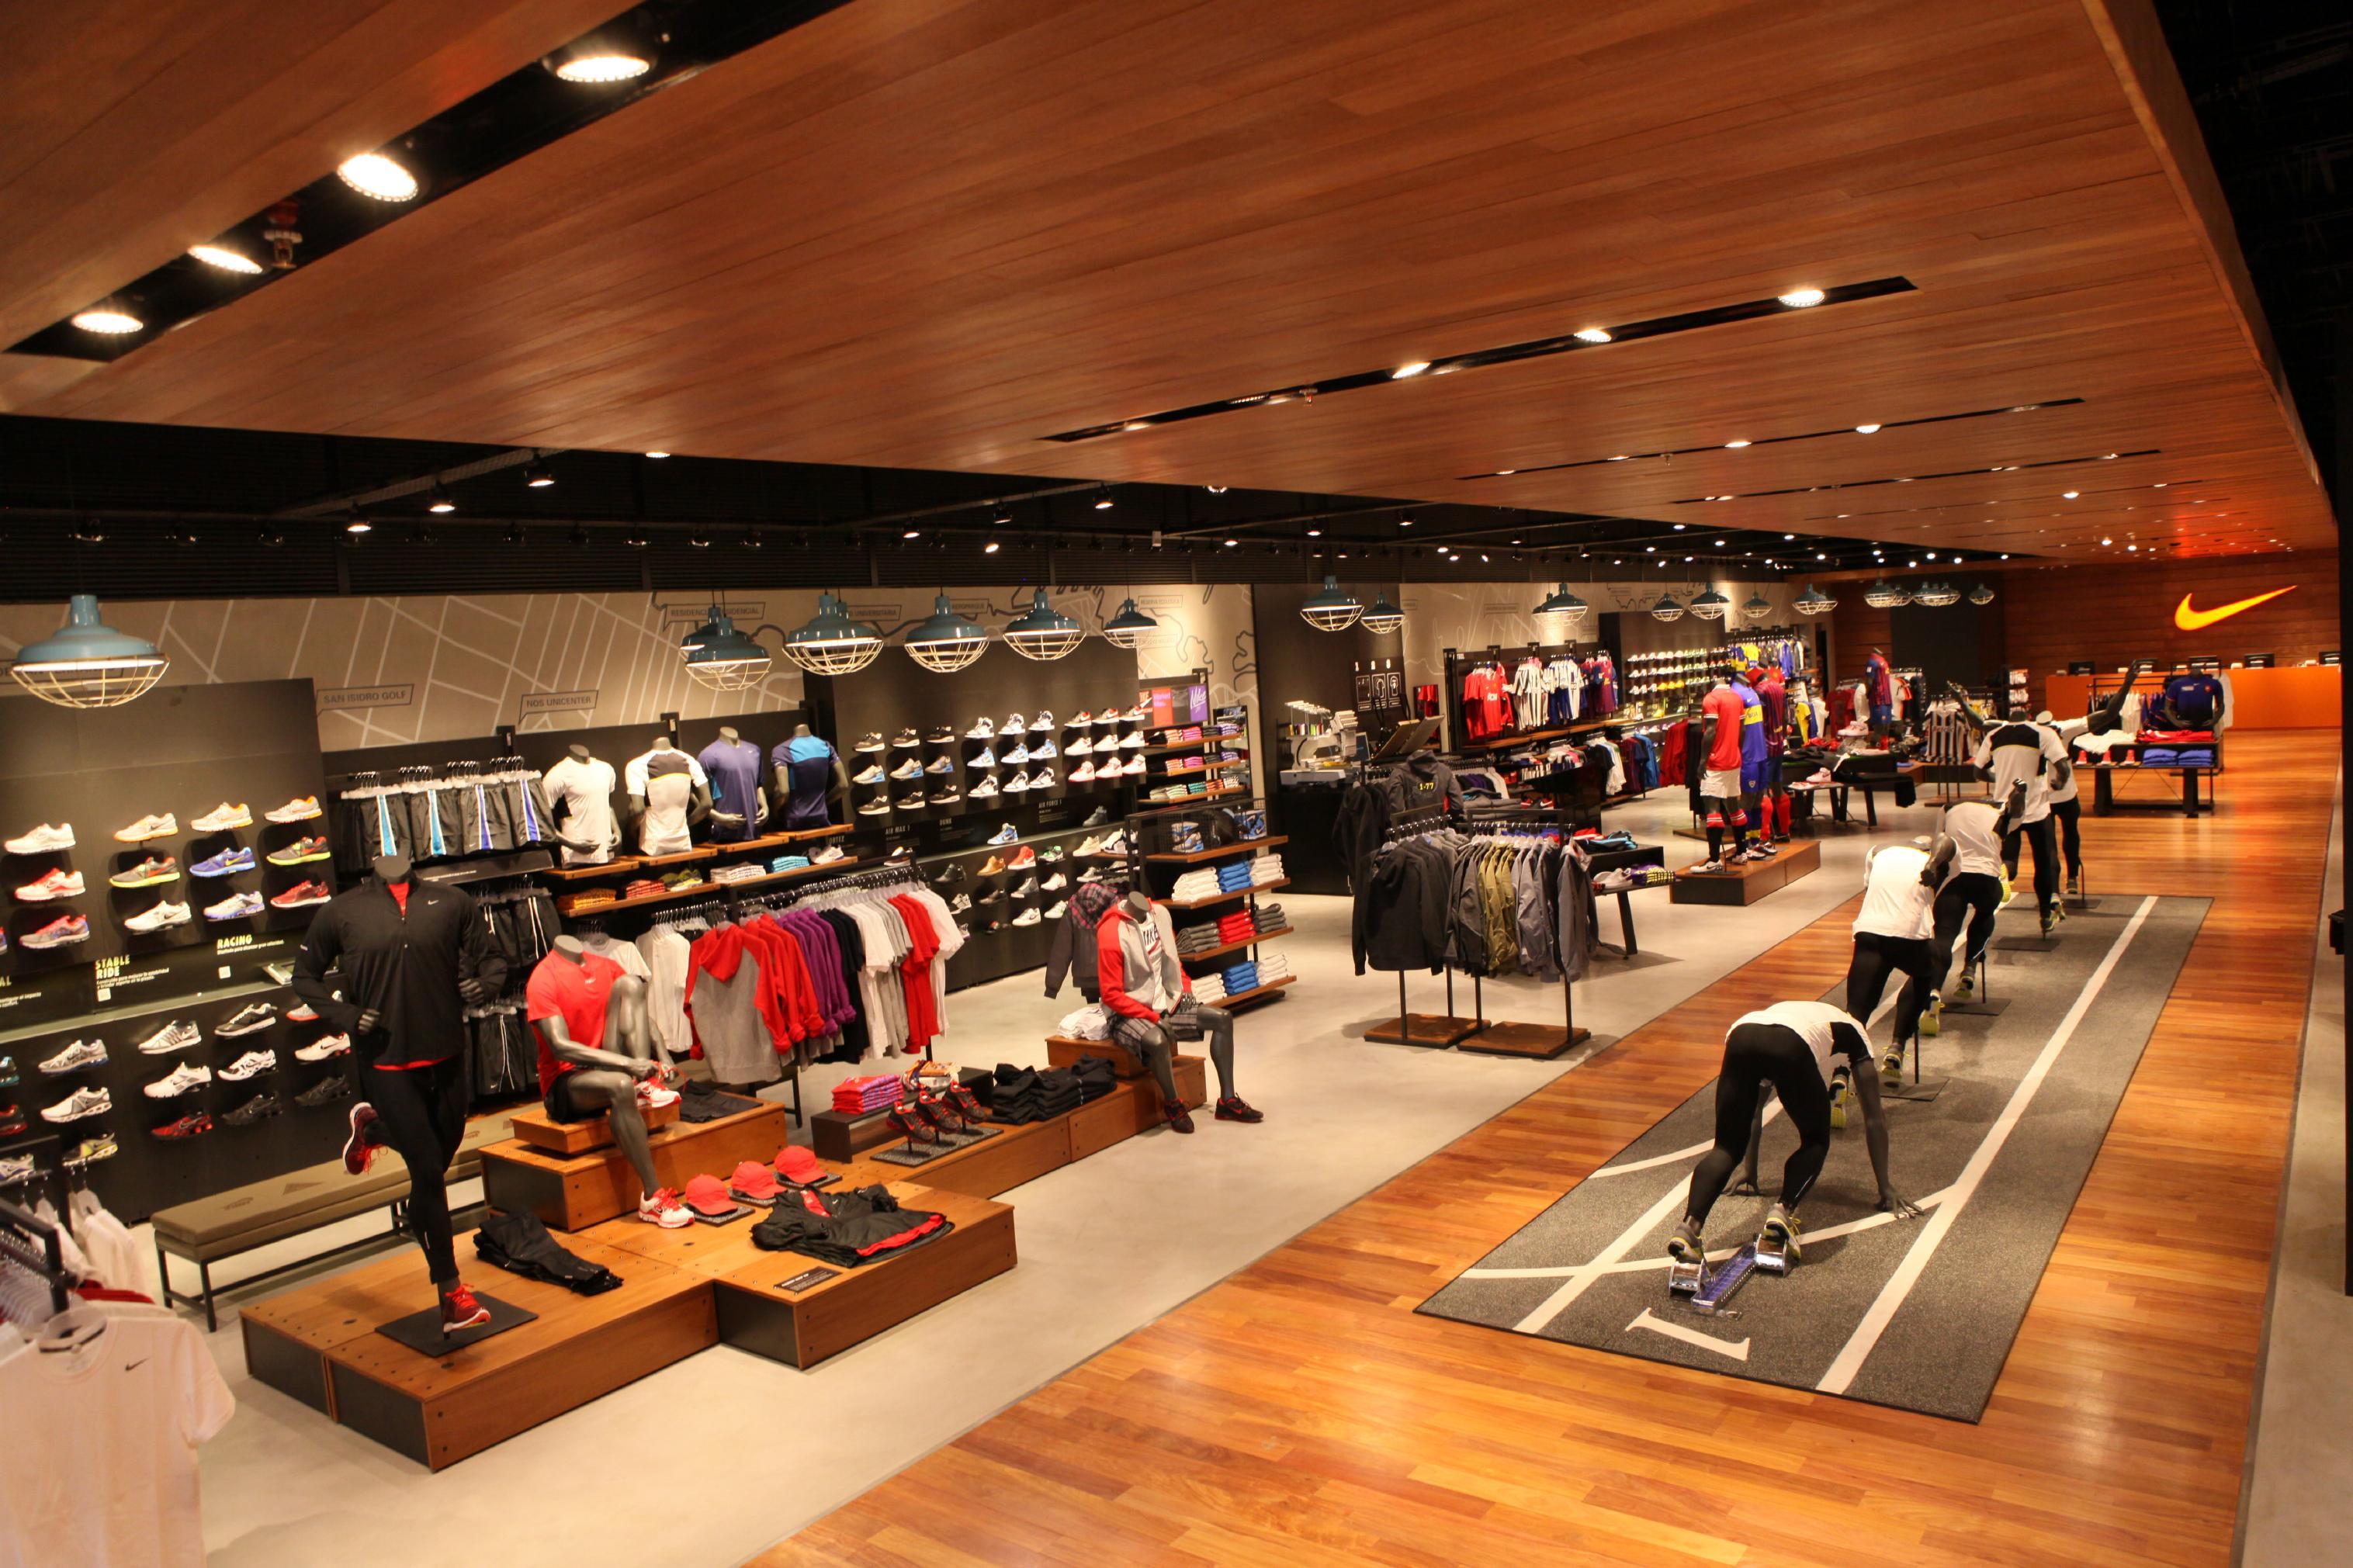 Nike_Unicenter_Store_General_View_original